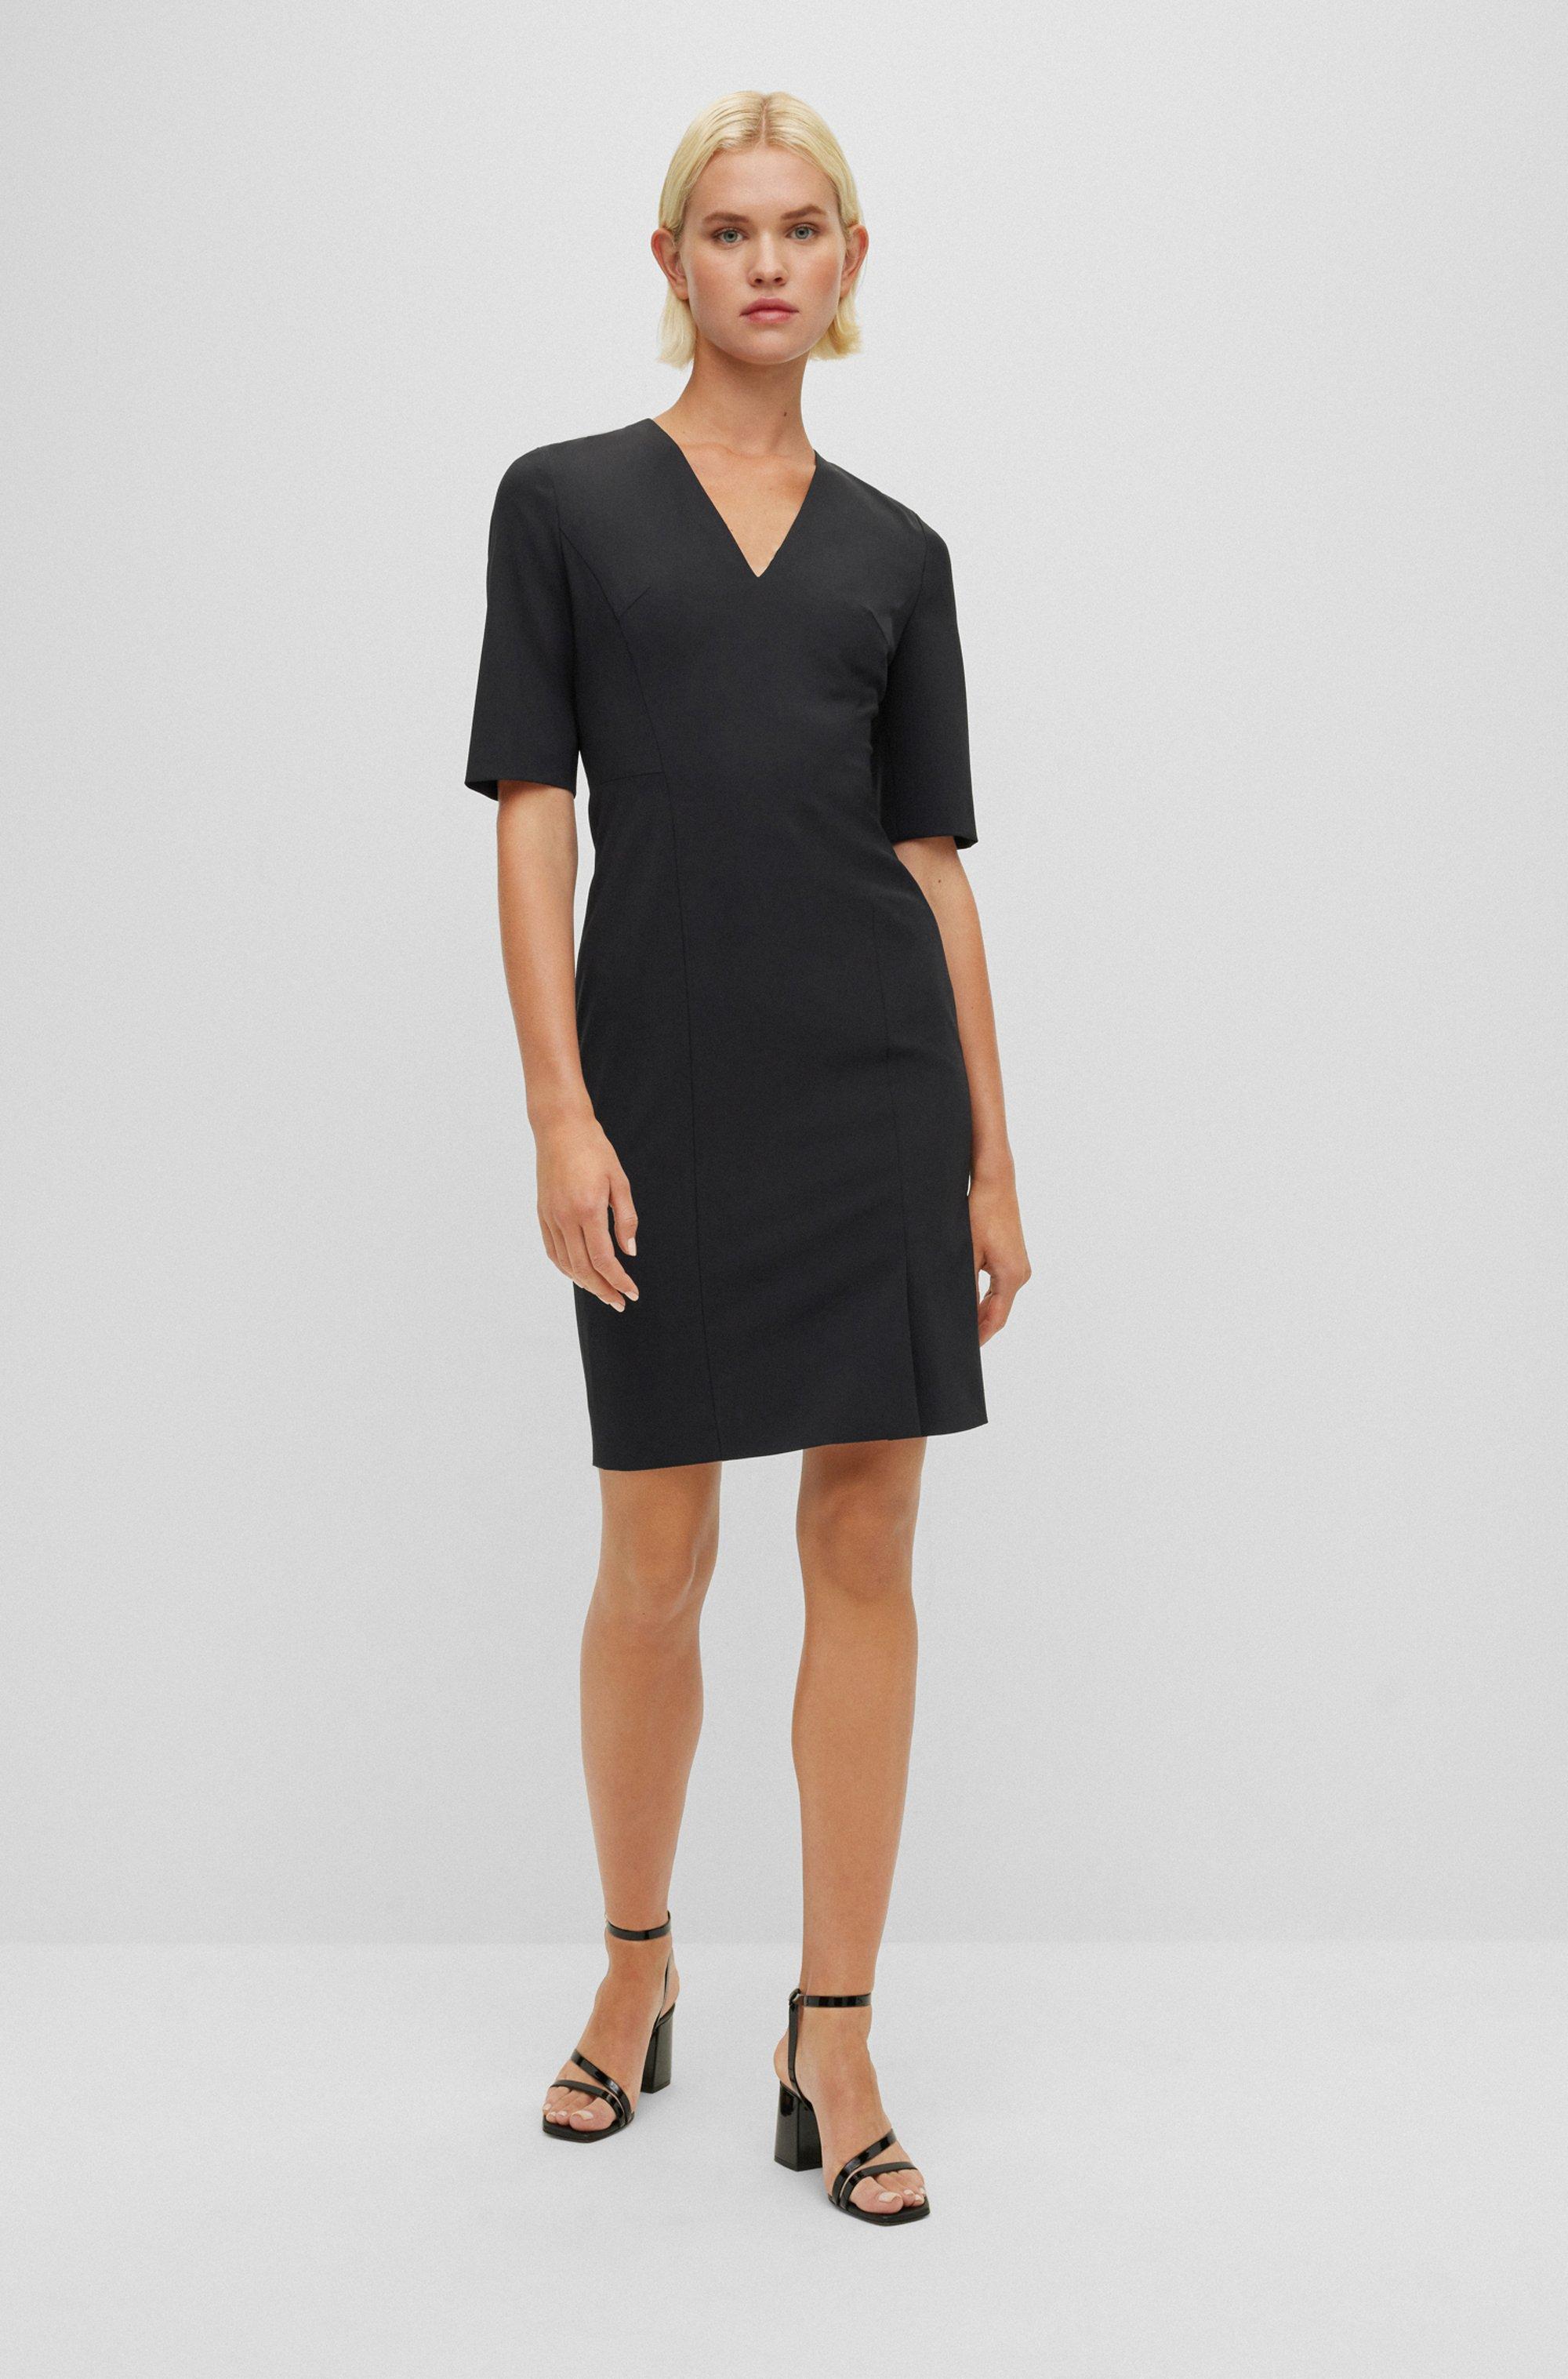 Short-sleeved dress in Italian stretch wool